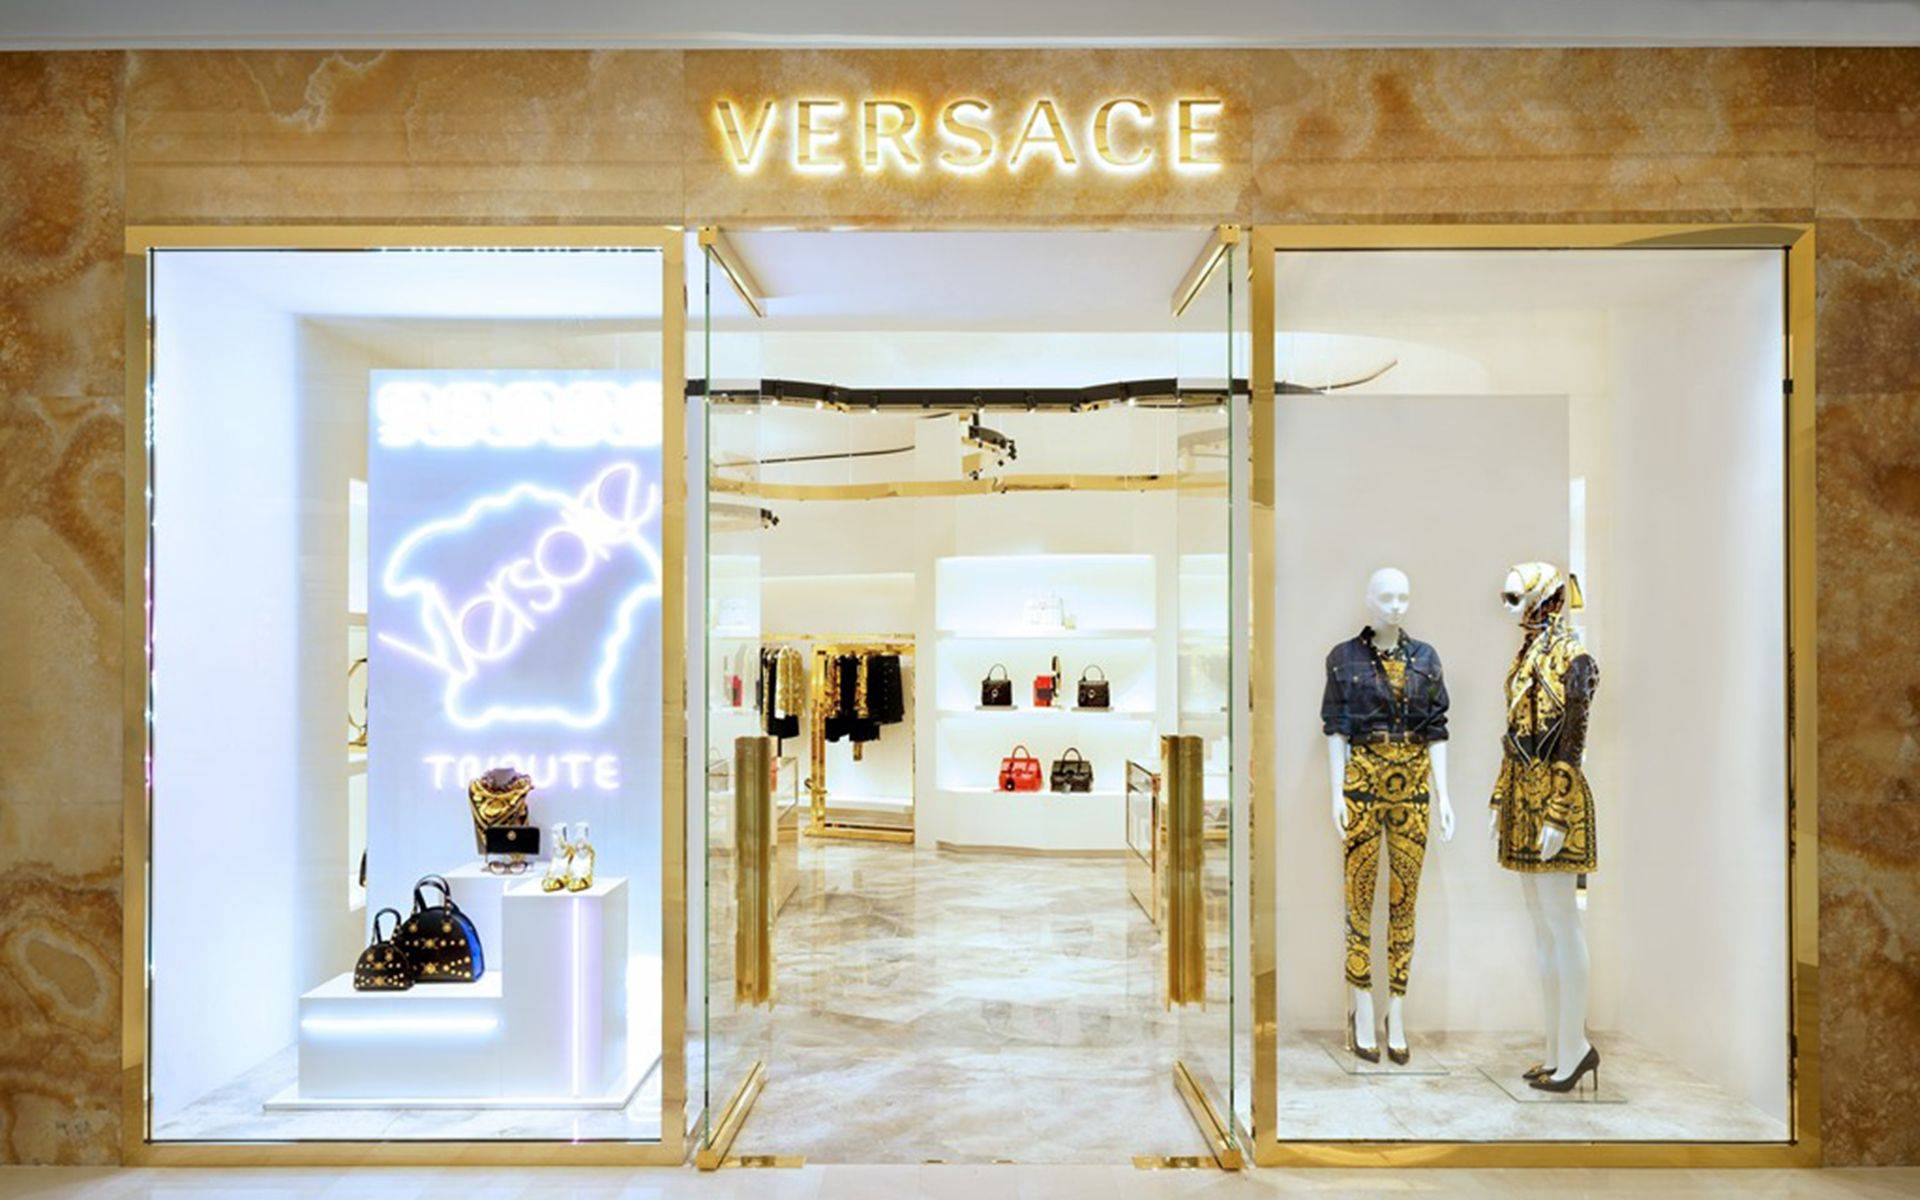 Versace Suria KLCC store front